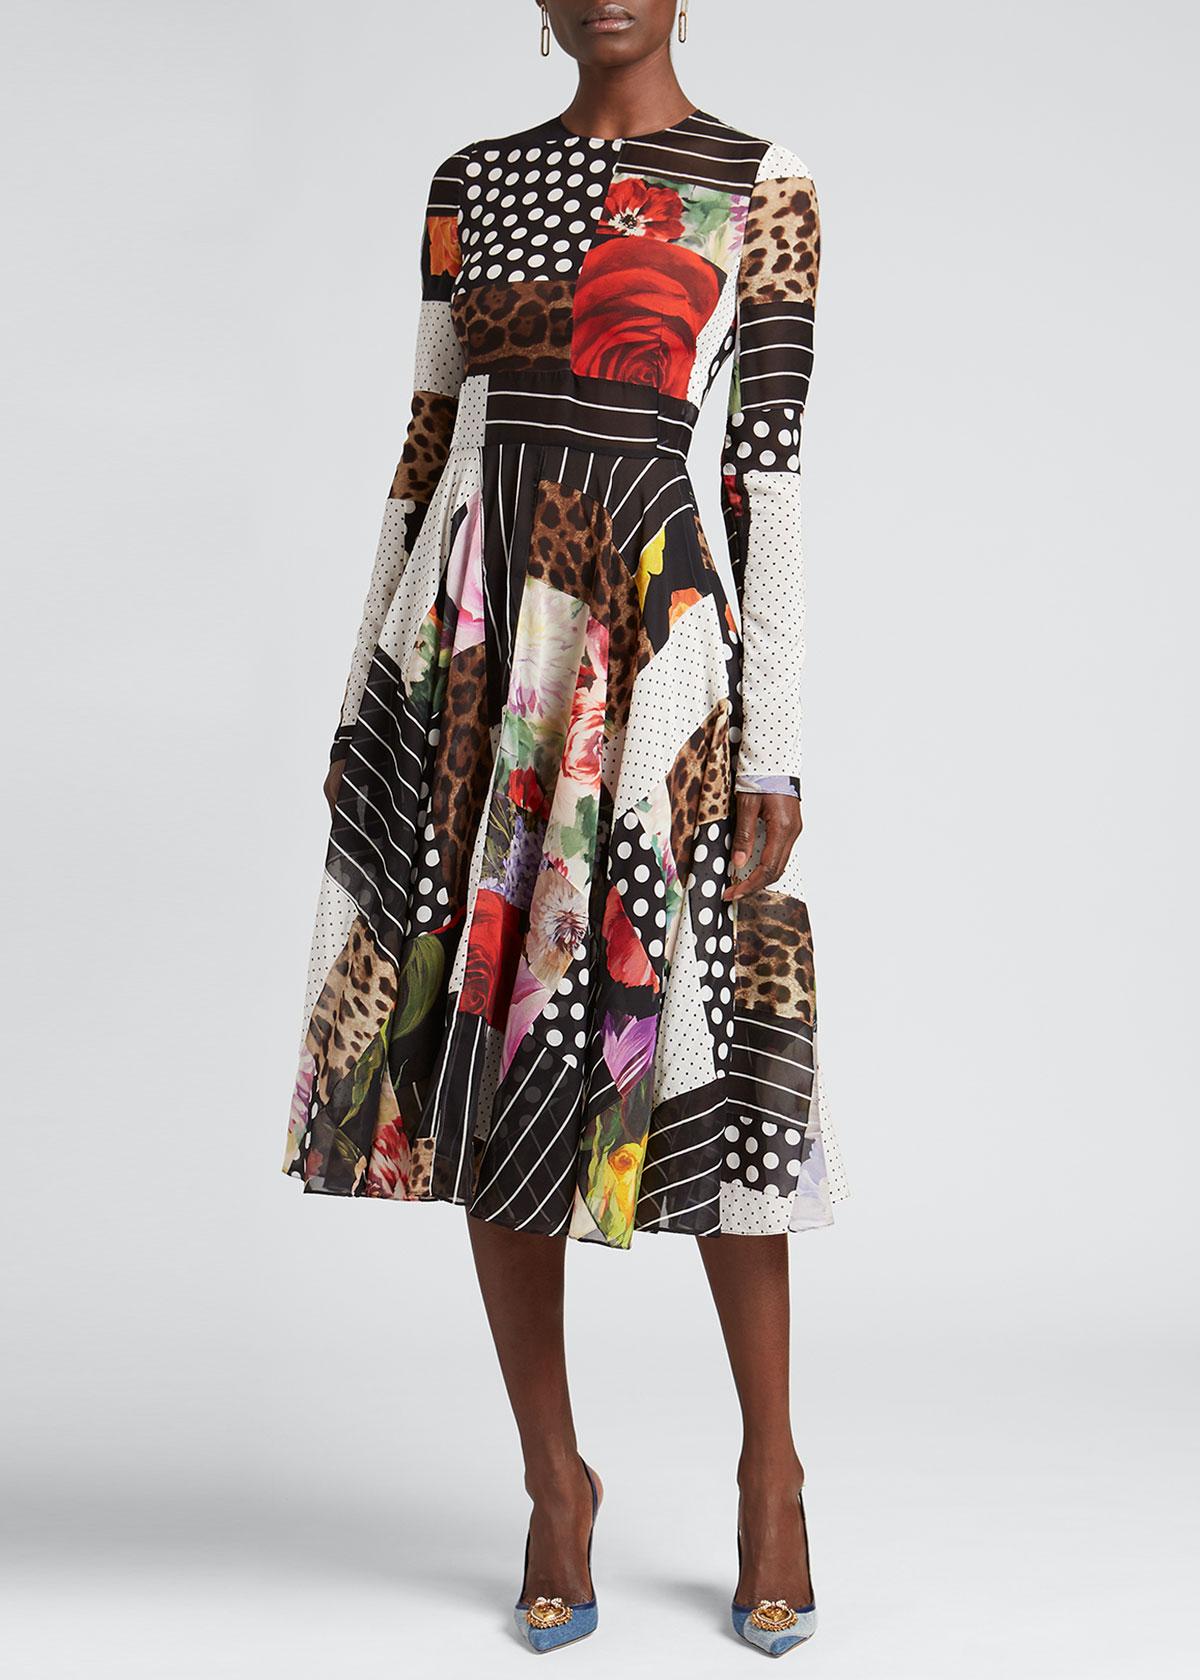 Dolce & Gabbana Downs PATCHWORK PRINT FIT-&-FLARE MIDI DRESS